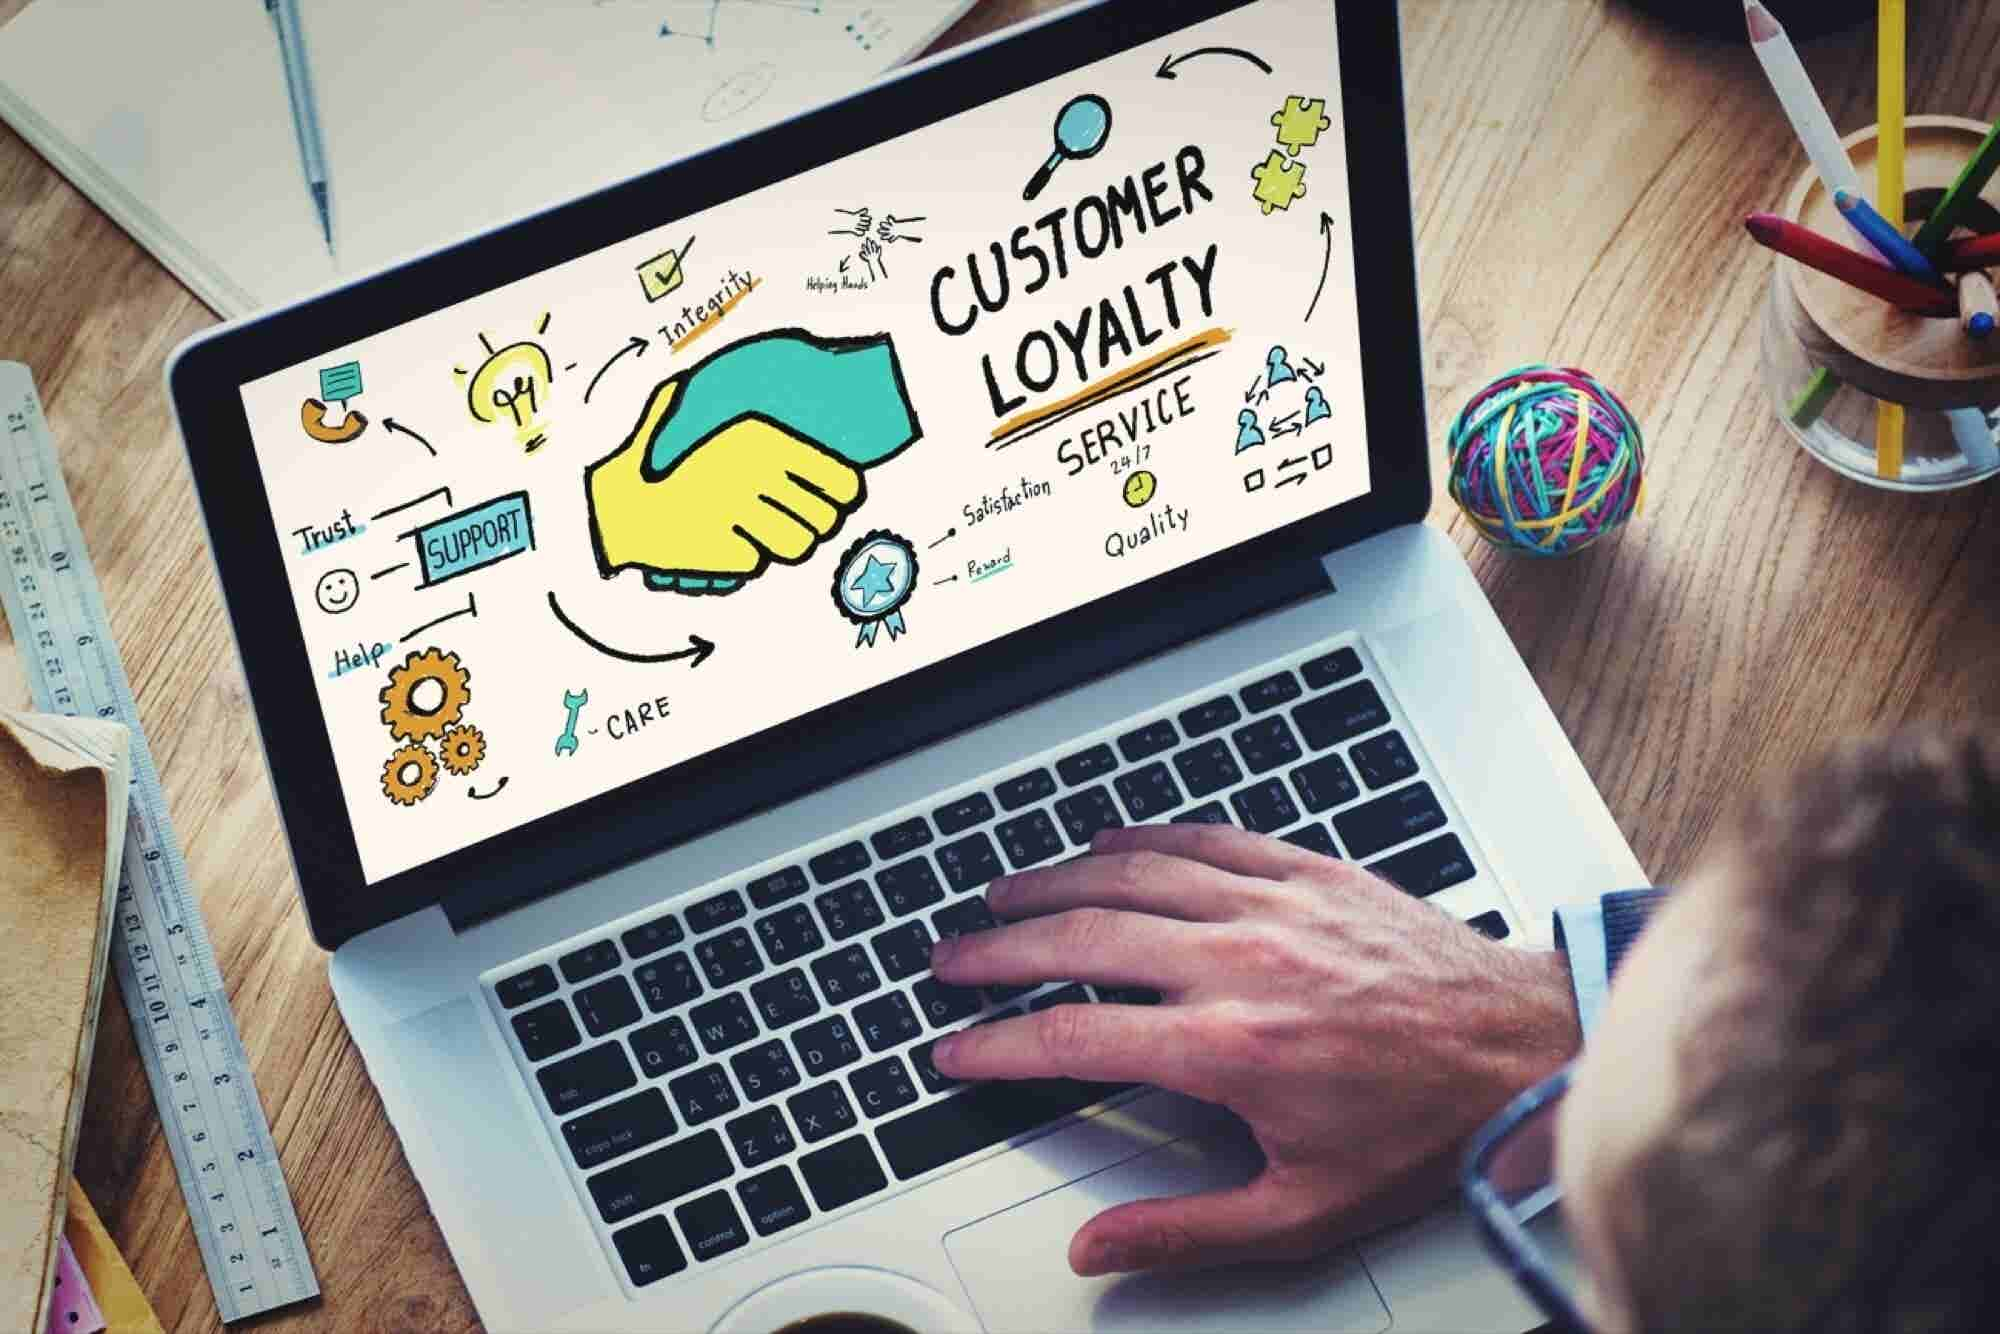 How to Keep Rocking on Customer Service